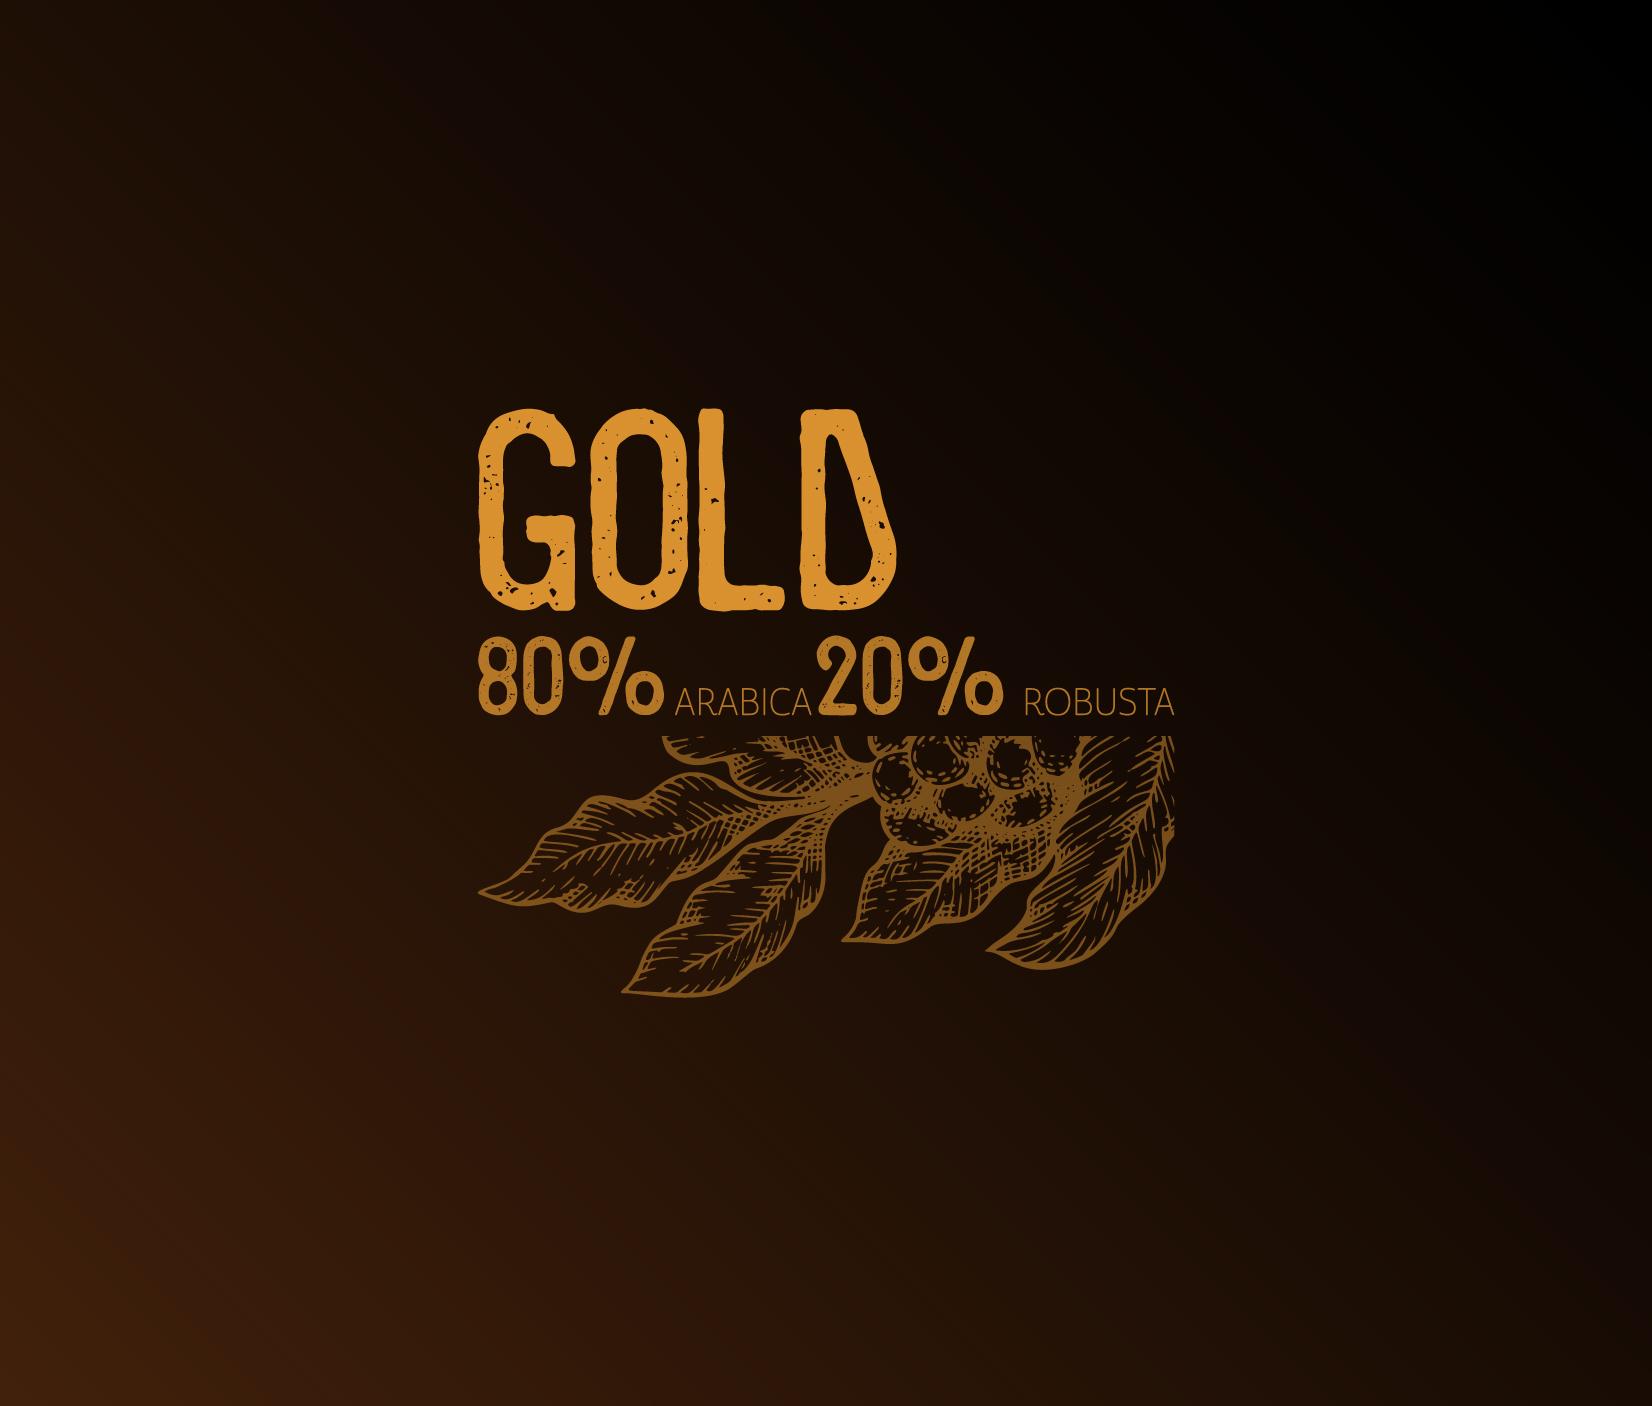 caffe_gold@2x-100